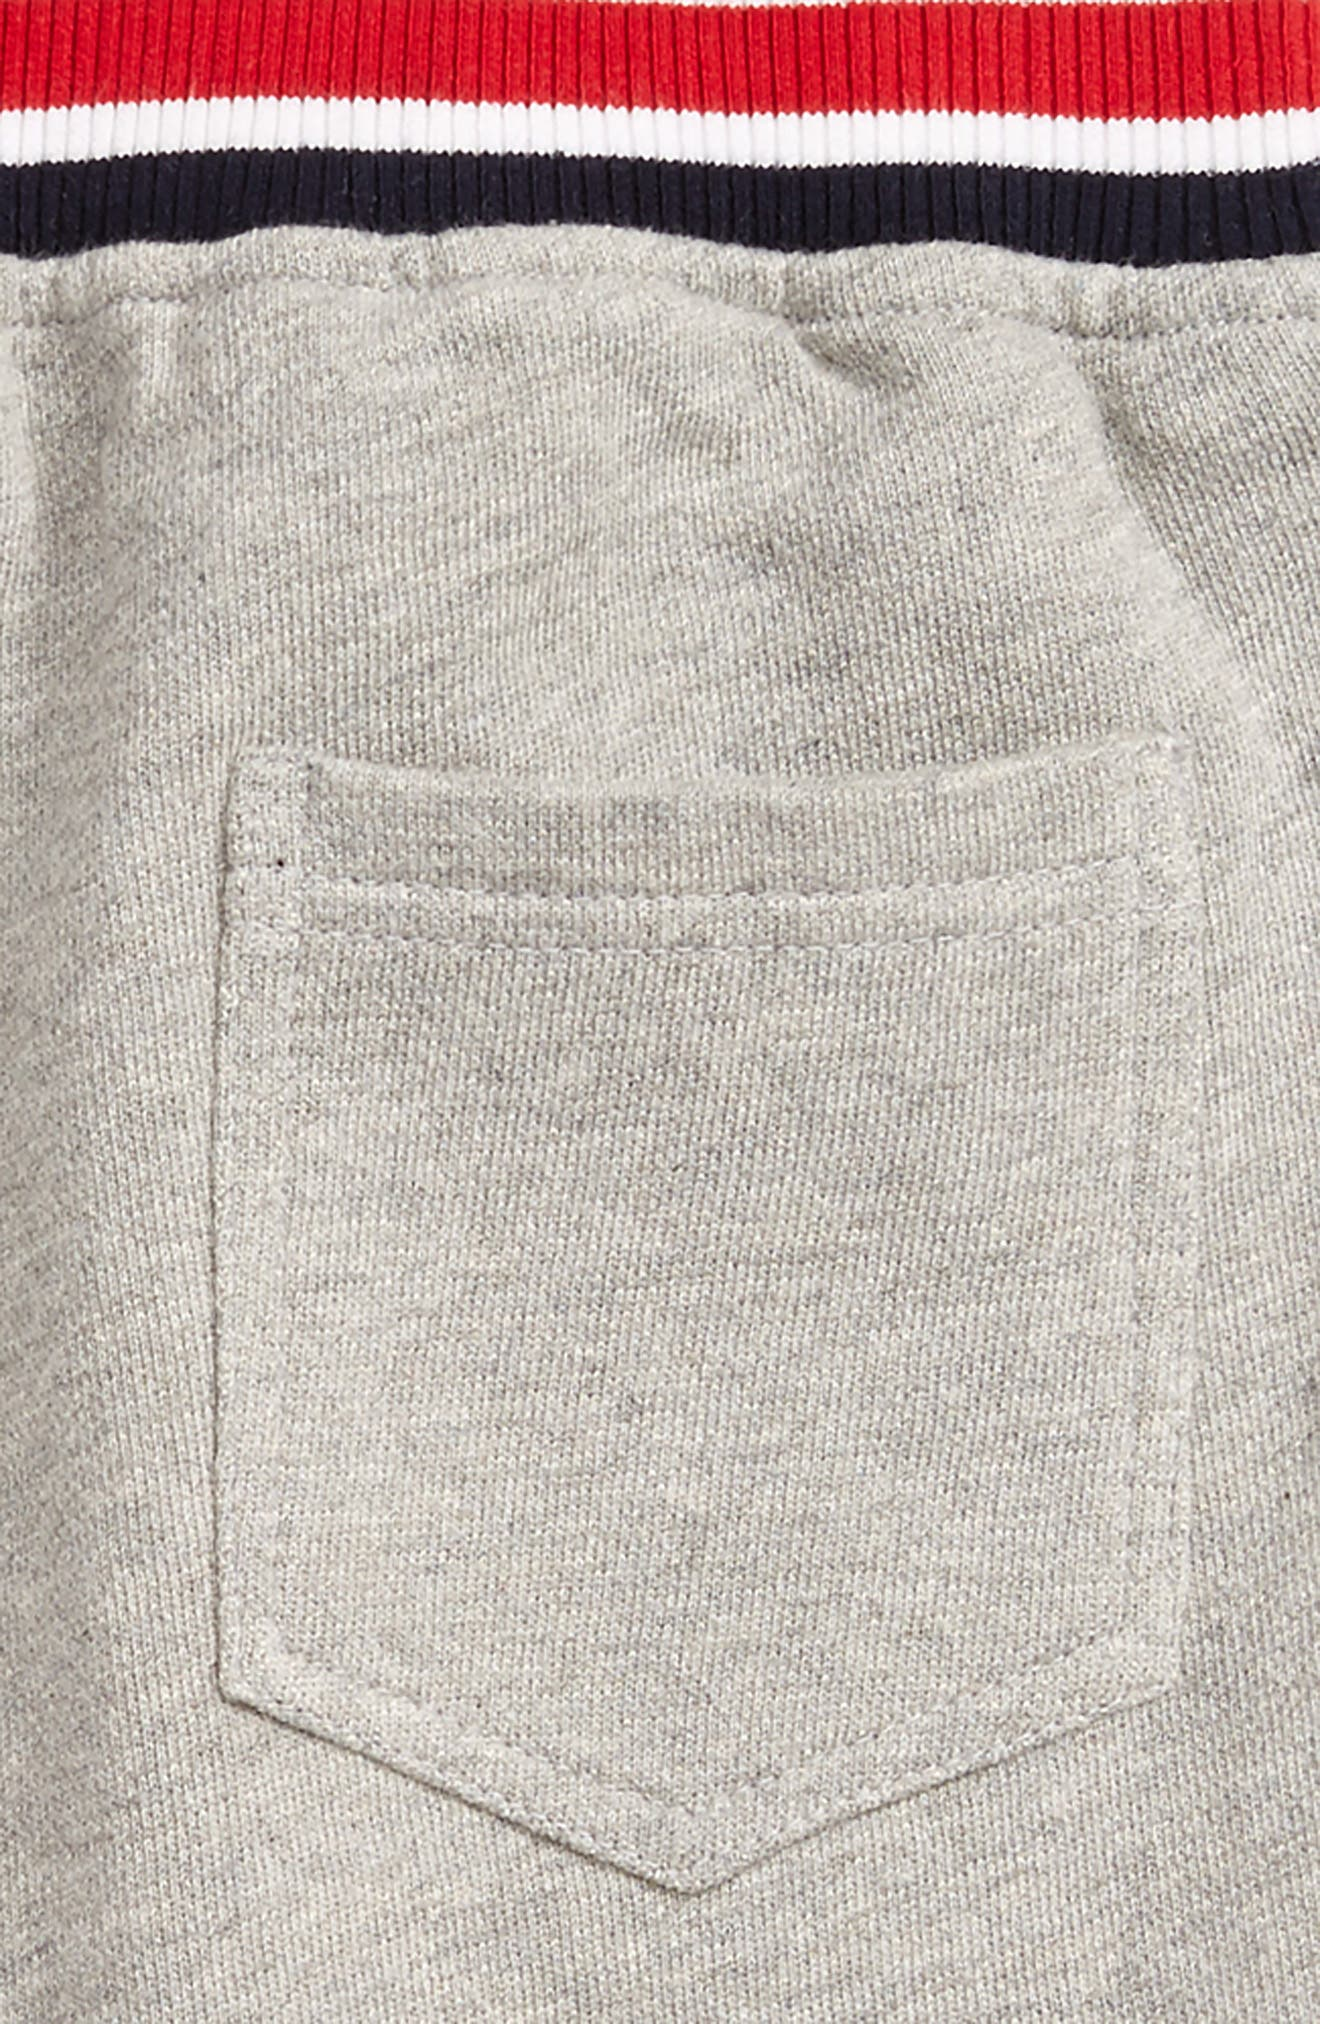 Varsity Knit Shorts,                             Alternate thumbnail 3, color,                             020